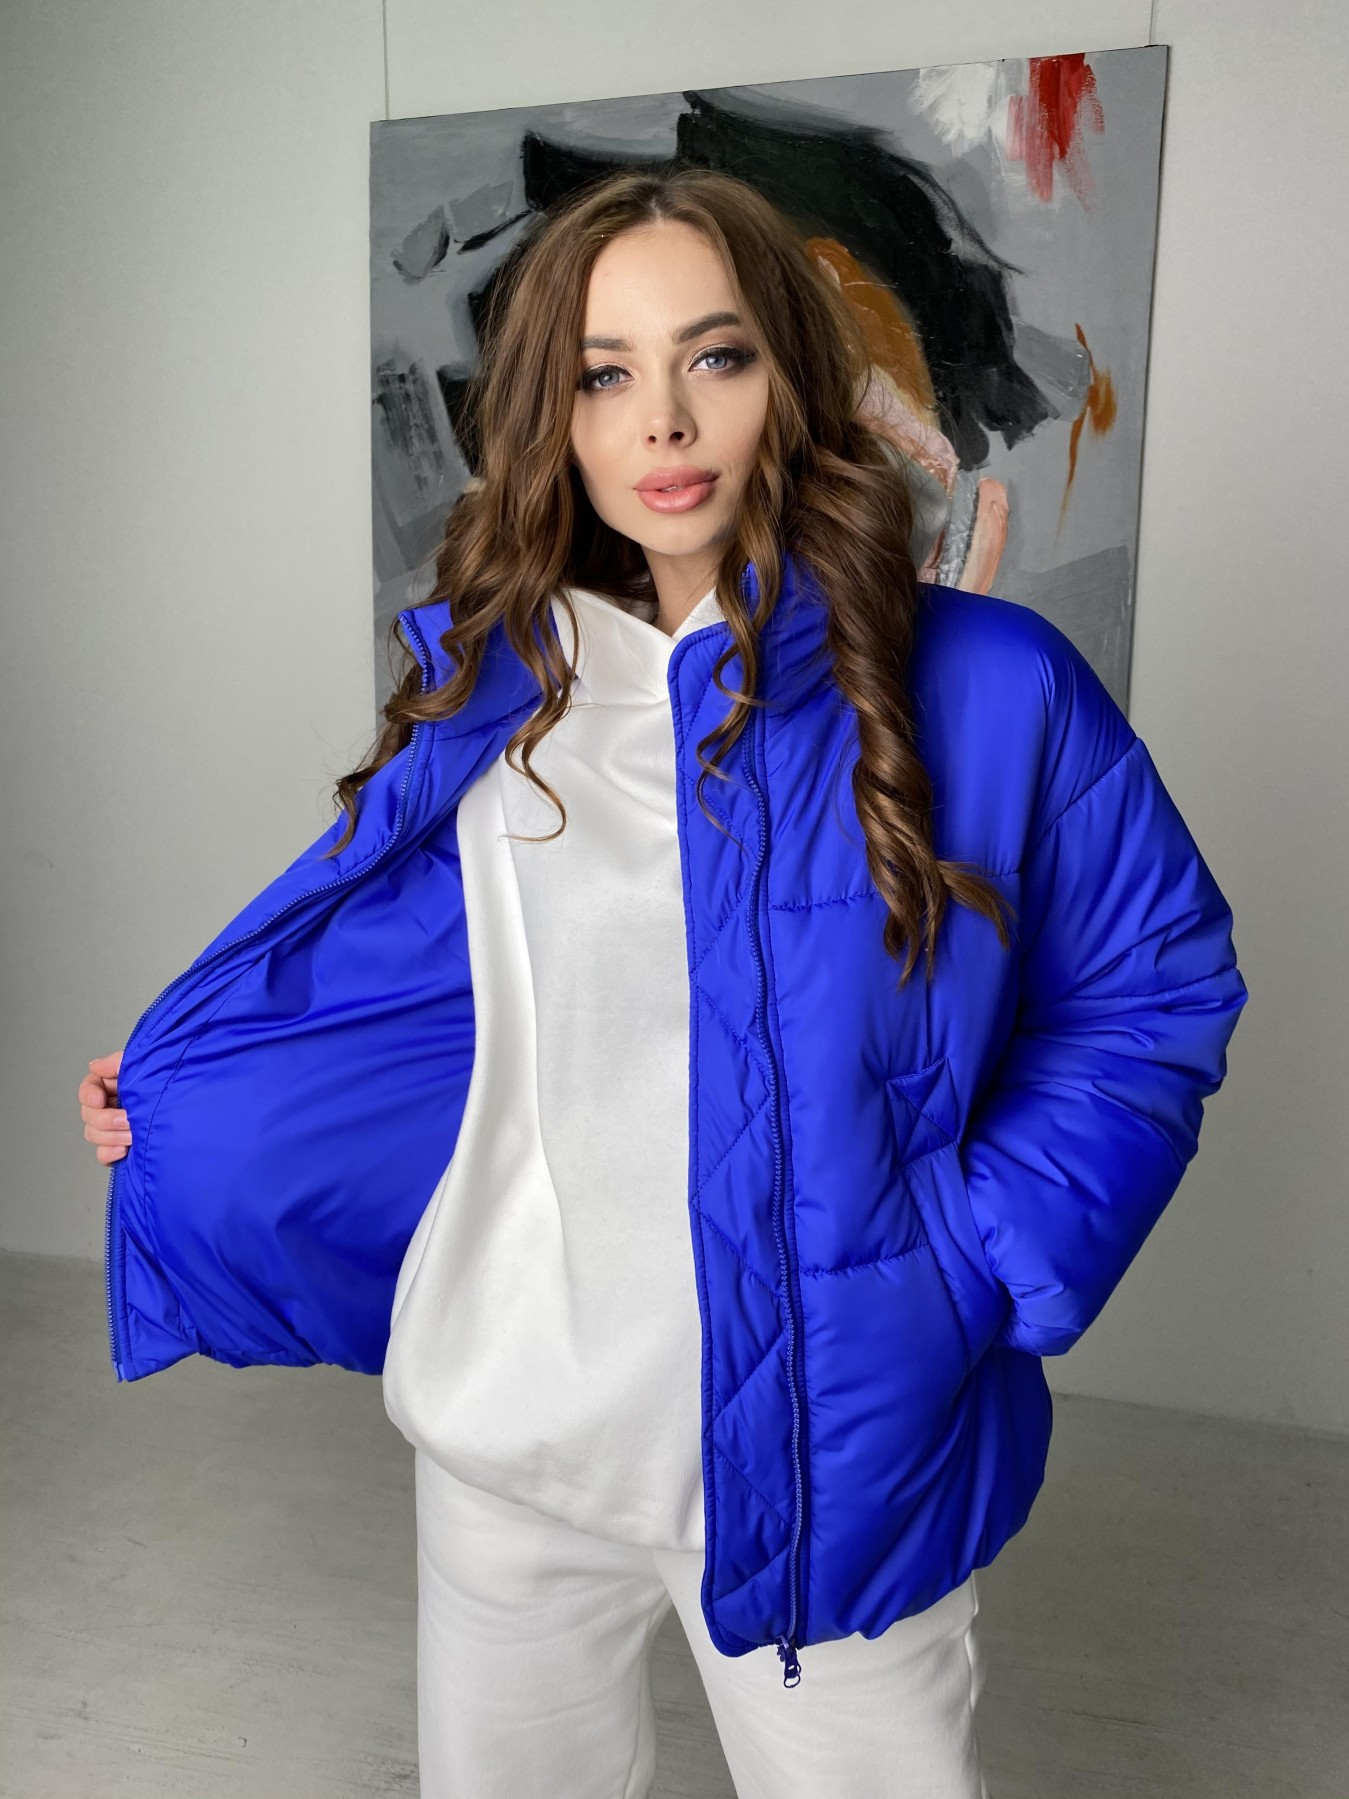 Муд куртка из плащевой ткани 10509 АРТ. 46852 Цвет: Электрик - фото 1, интернет магазин tm-modus.ru